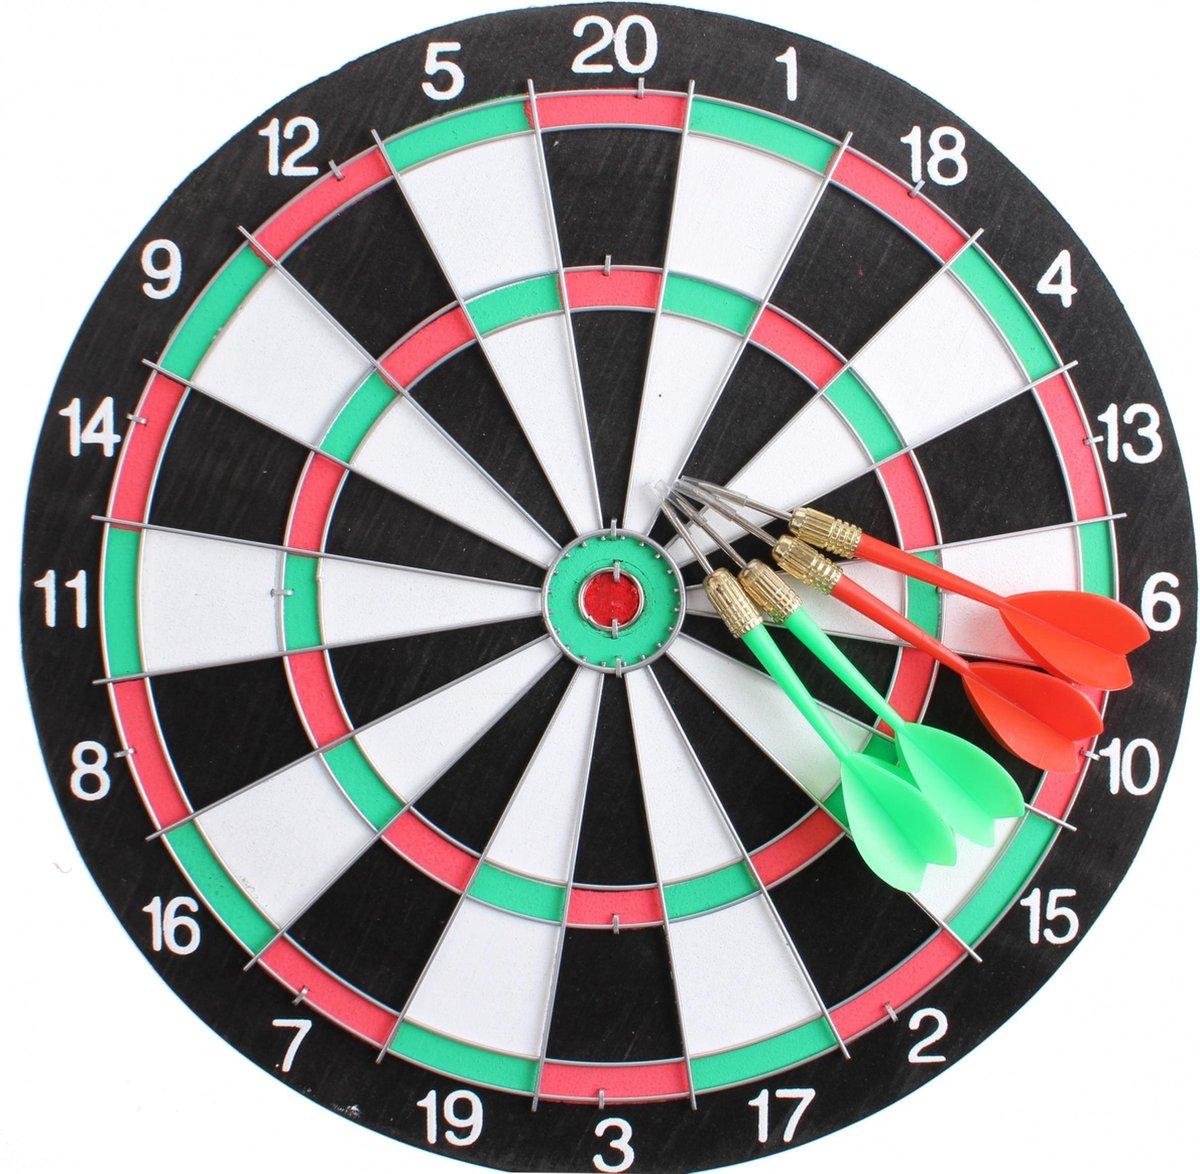 Master Darts Dartbord 28,5 Cm Met 4 Pijlen